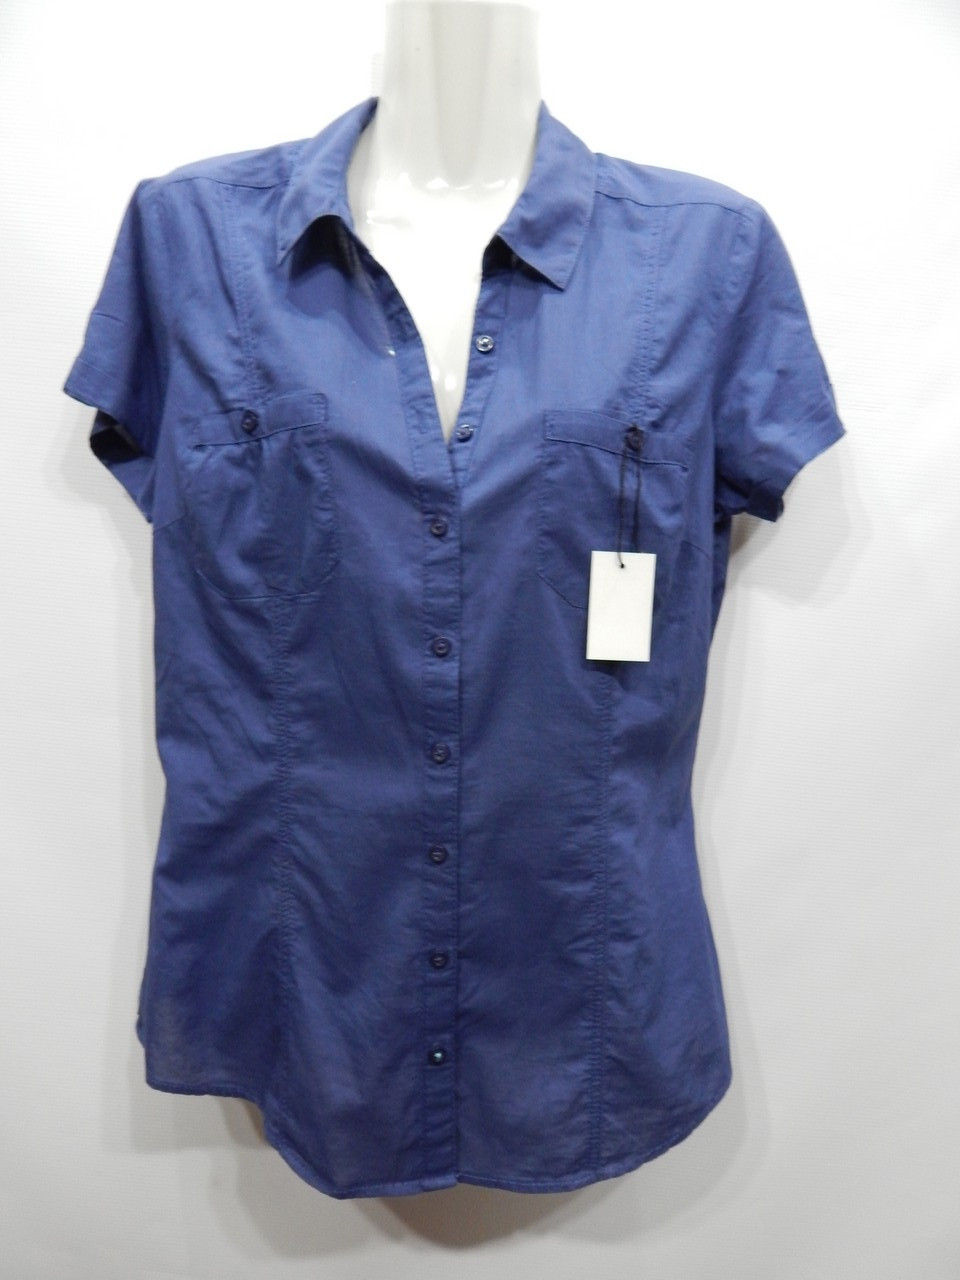 Блуза легкая фирменная женская CLOCKHOUSE 46-48 р.210бж